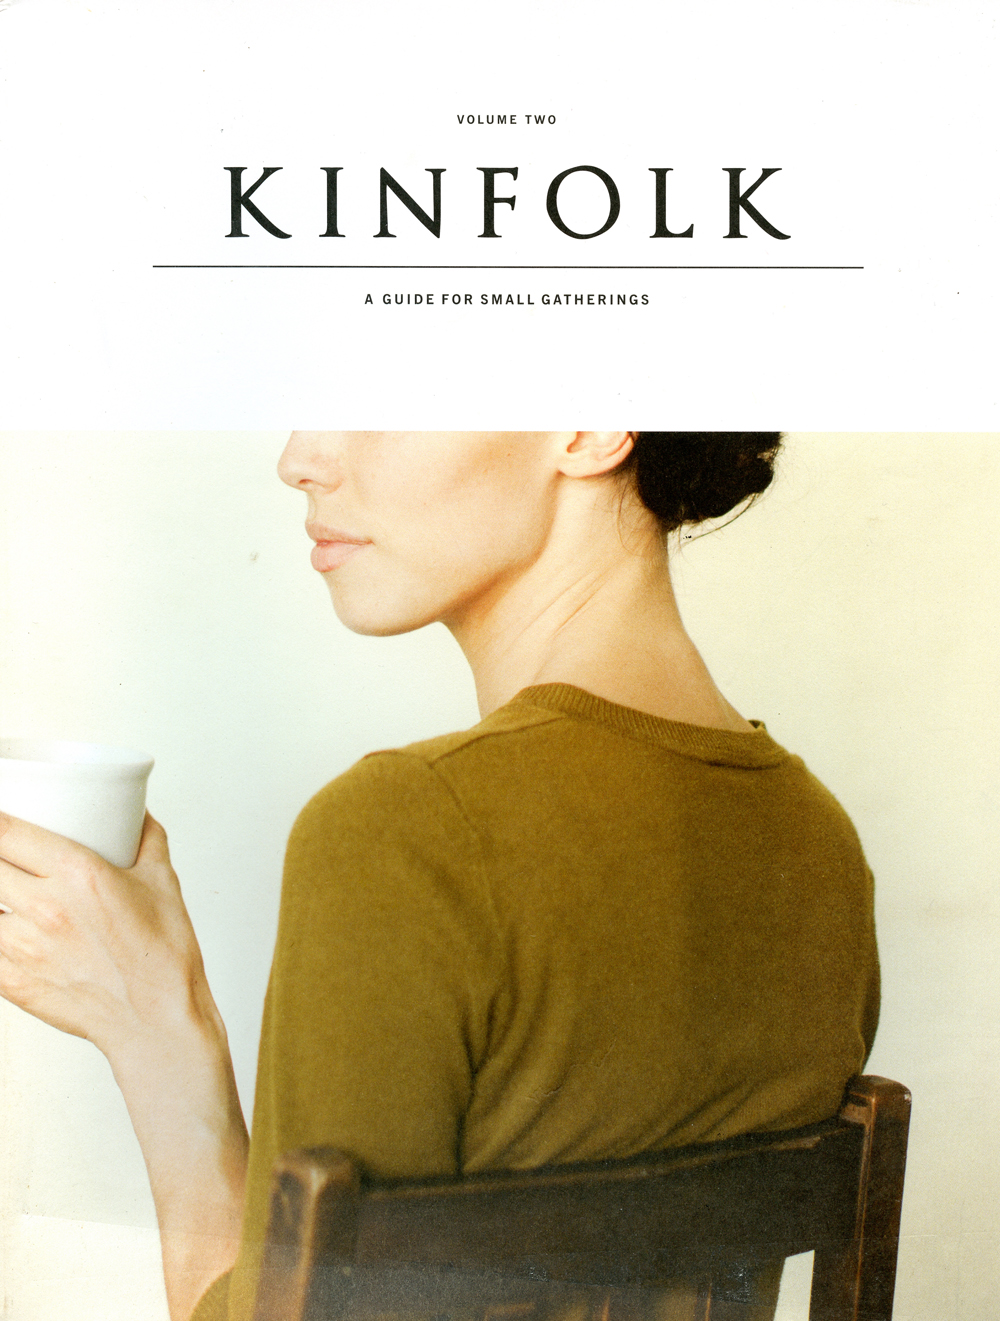 kinfolk, volume 2 - scan 1.jpg